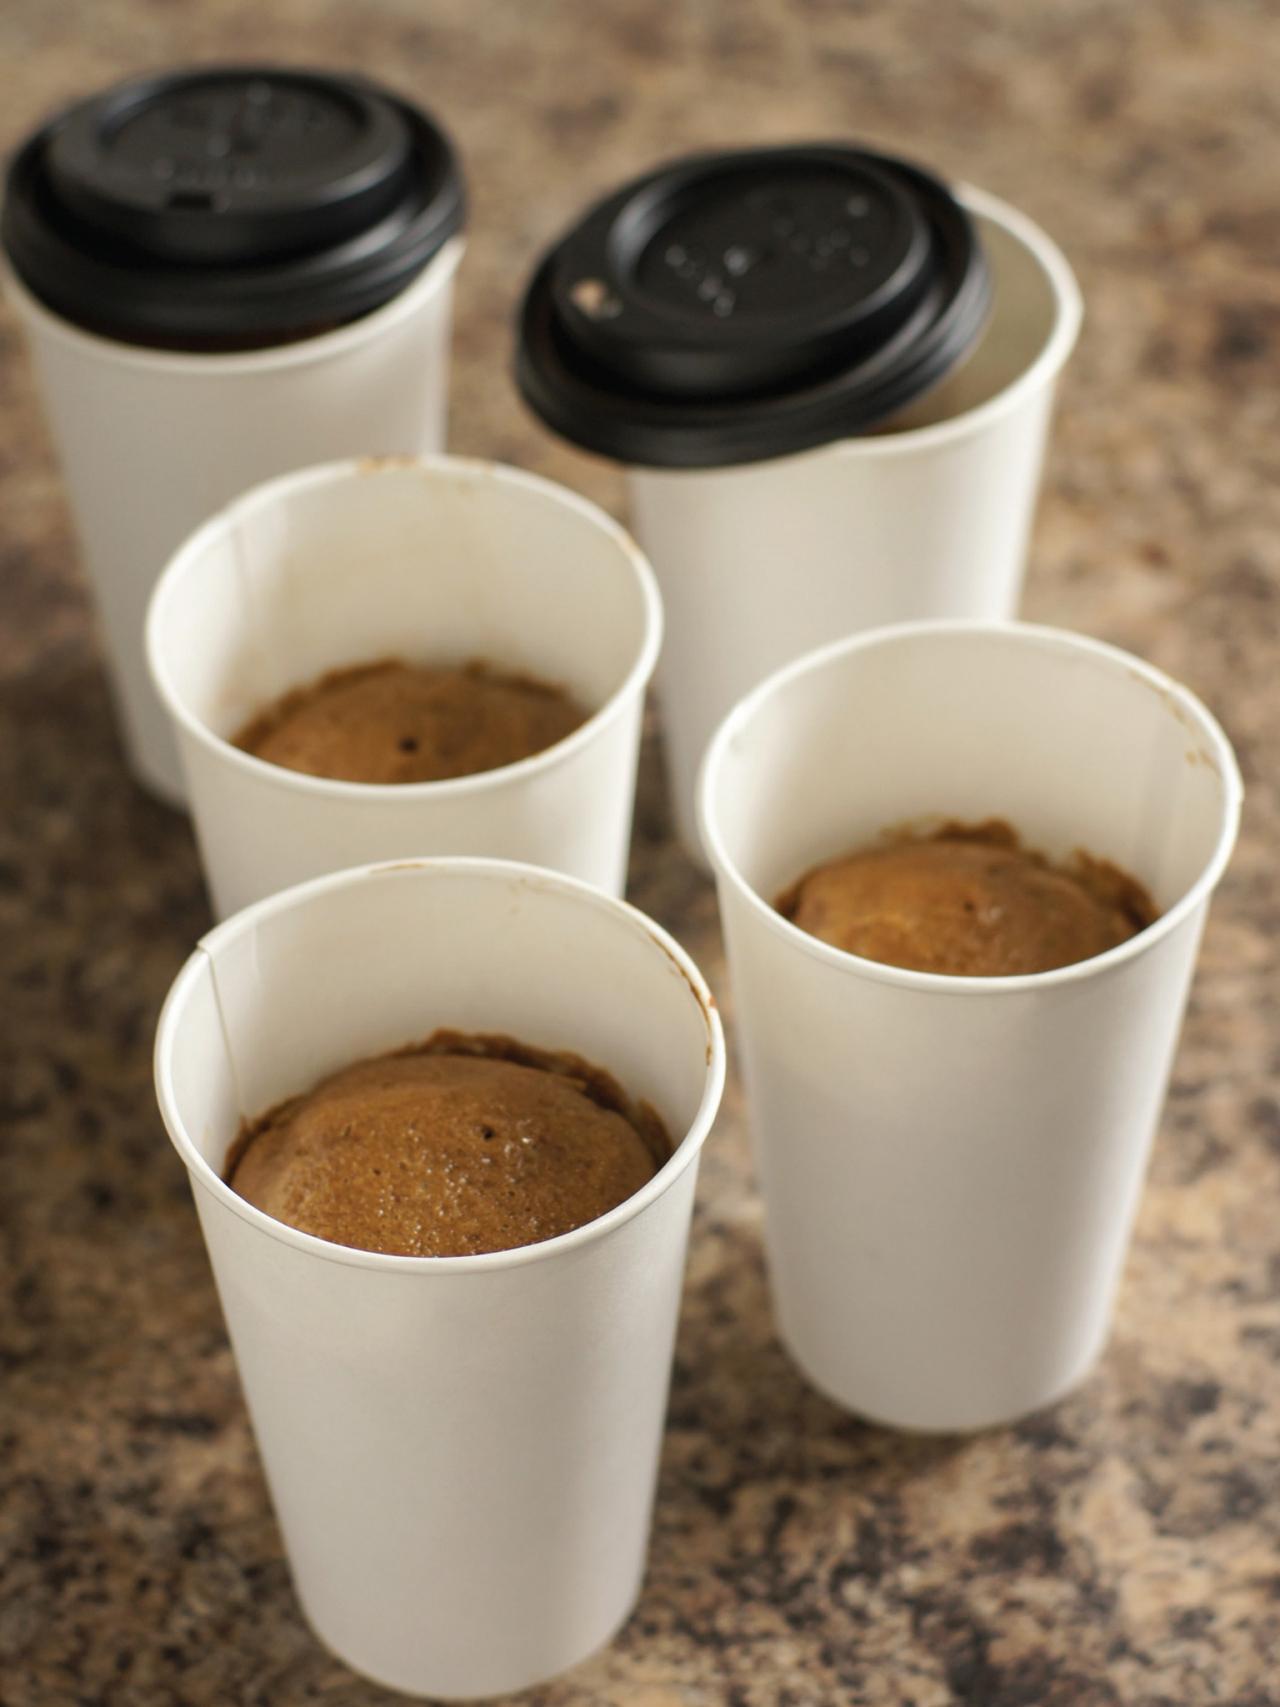 Baking Cupcakes In Coffee Mugs